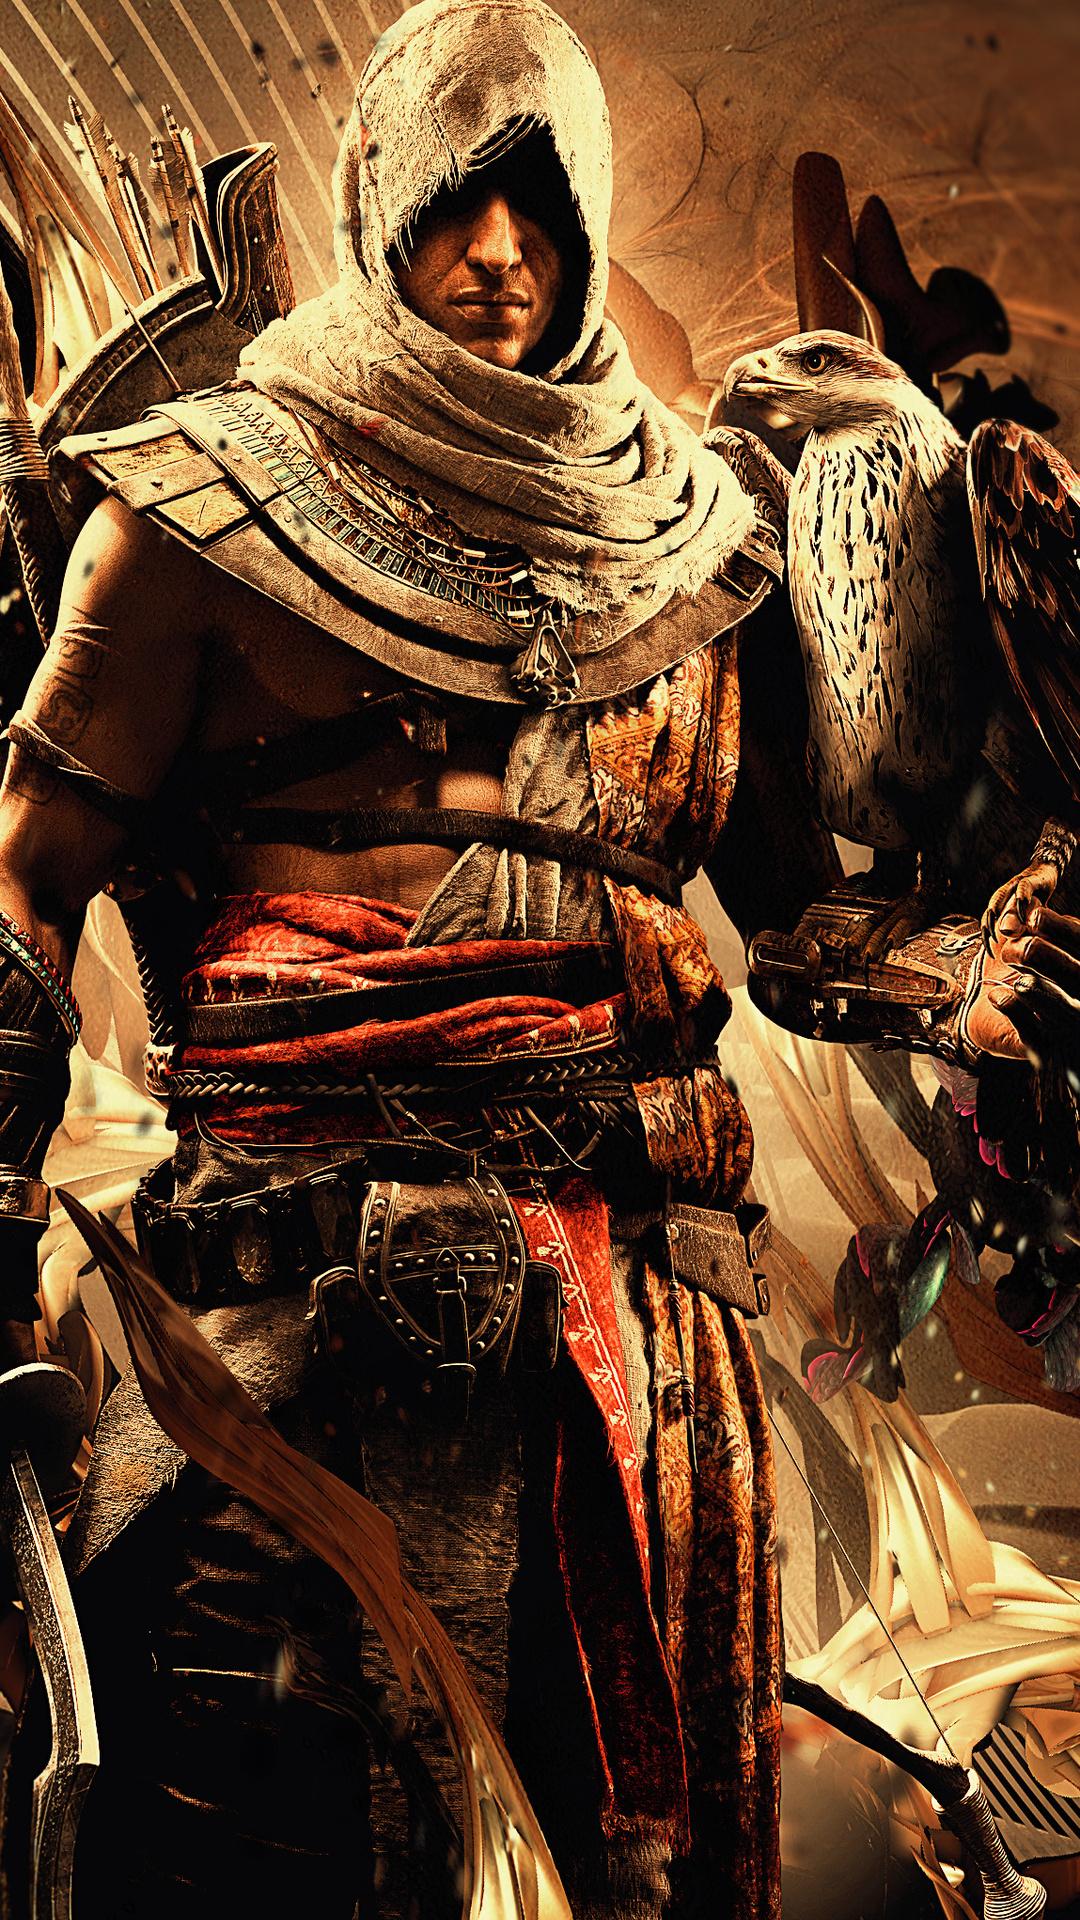 1080x1920 Bayek Of Siwa Assassins Creed Origins 4k Iphone 7 6s 6